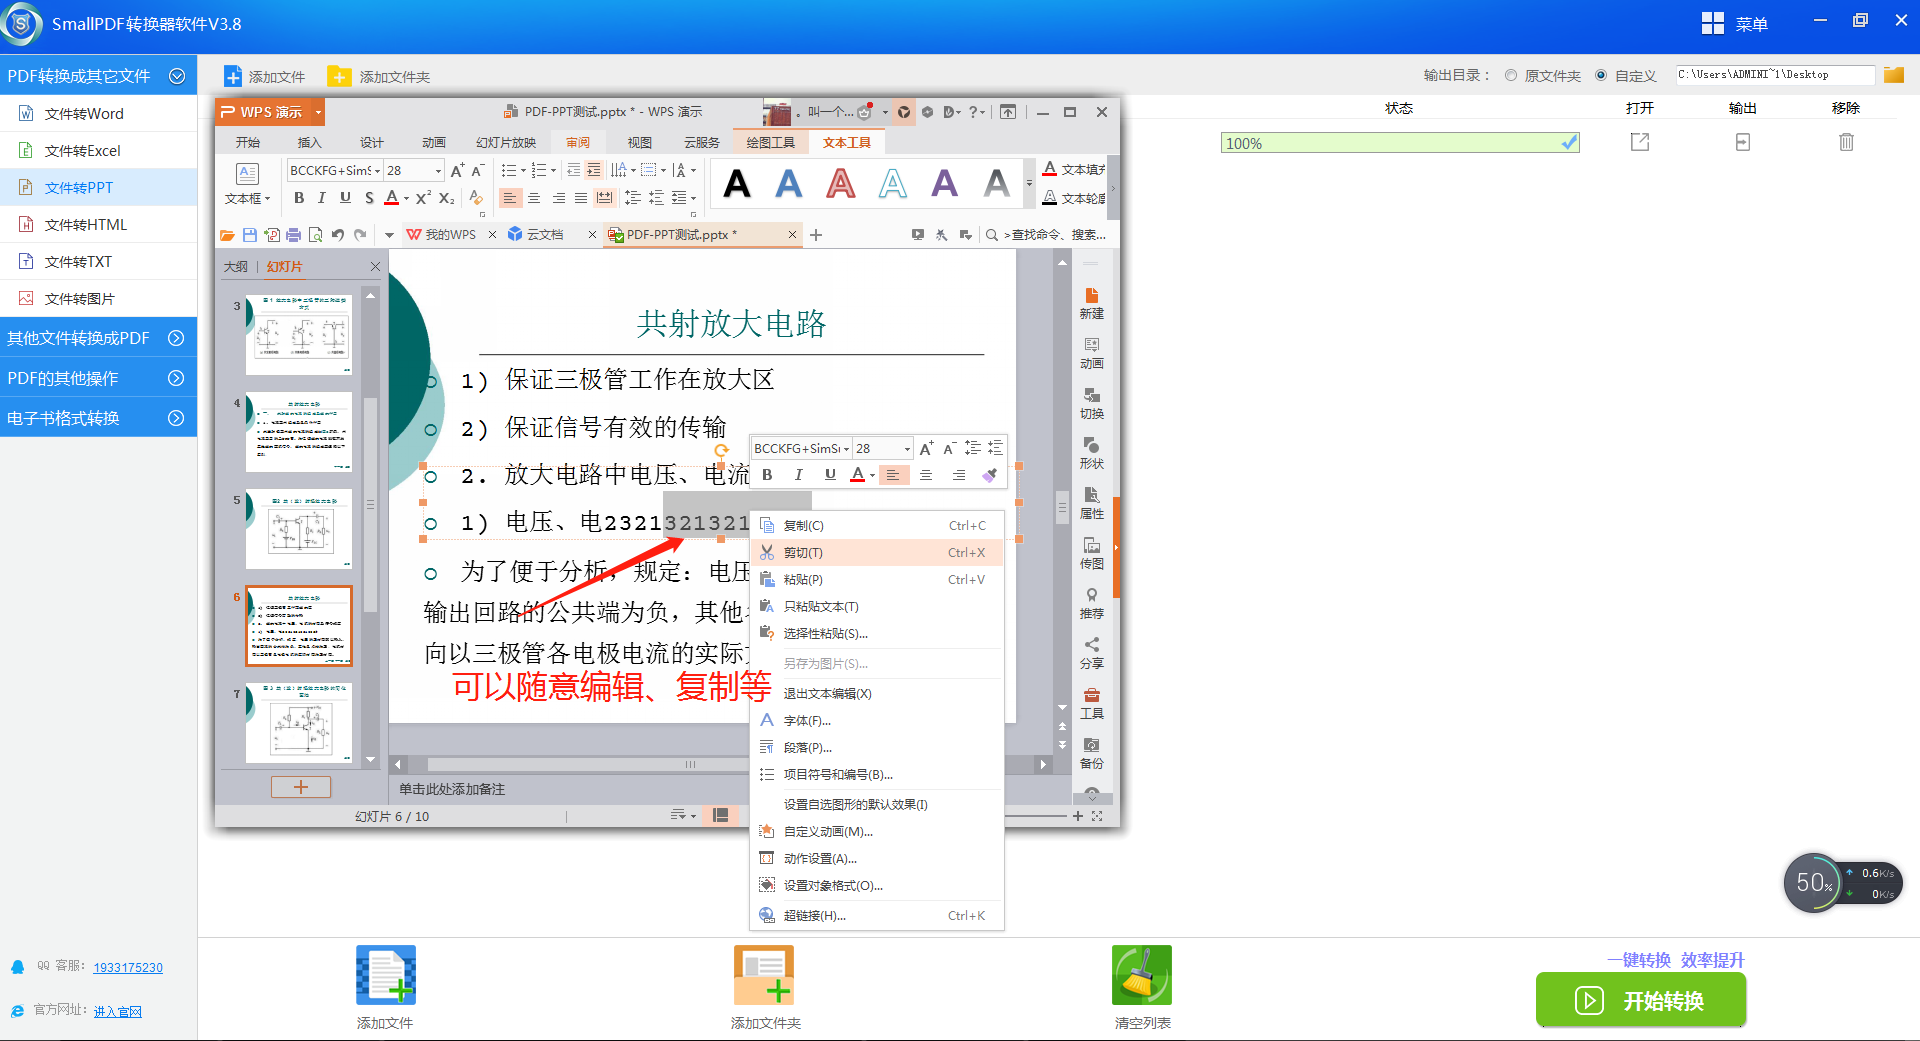 smallpdf转换器软件V3.8的pdf转换成pdf操作流程-5